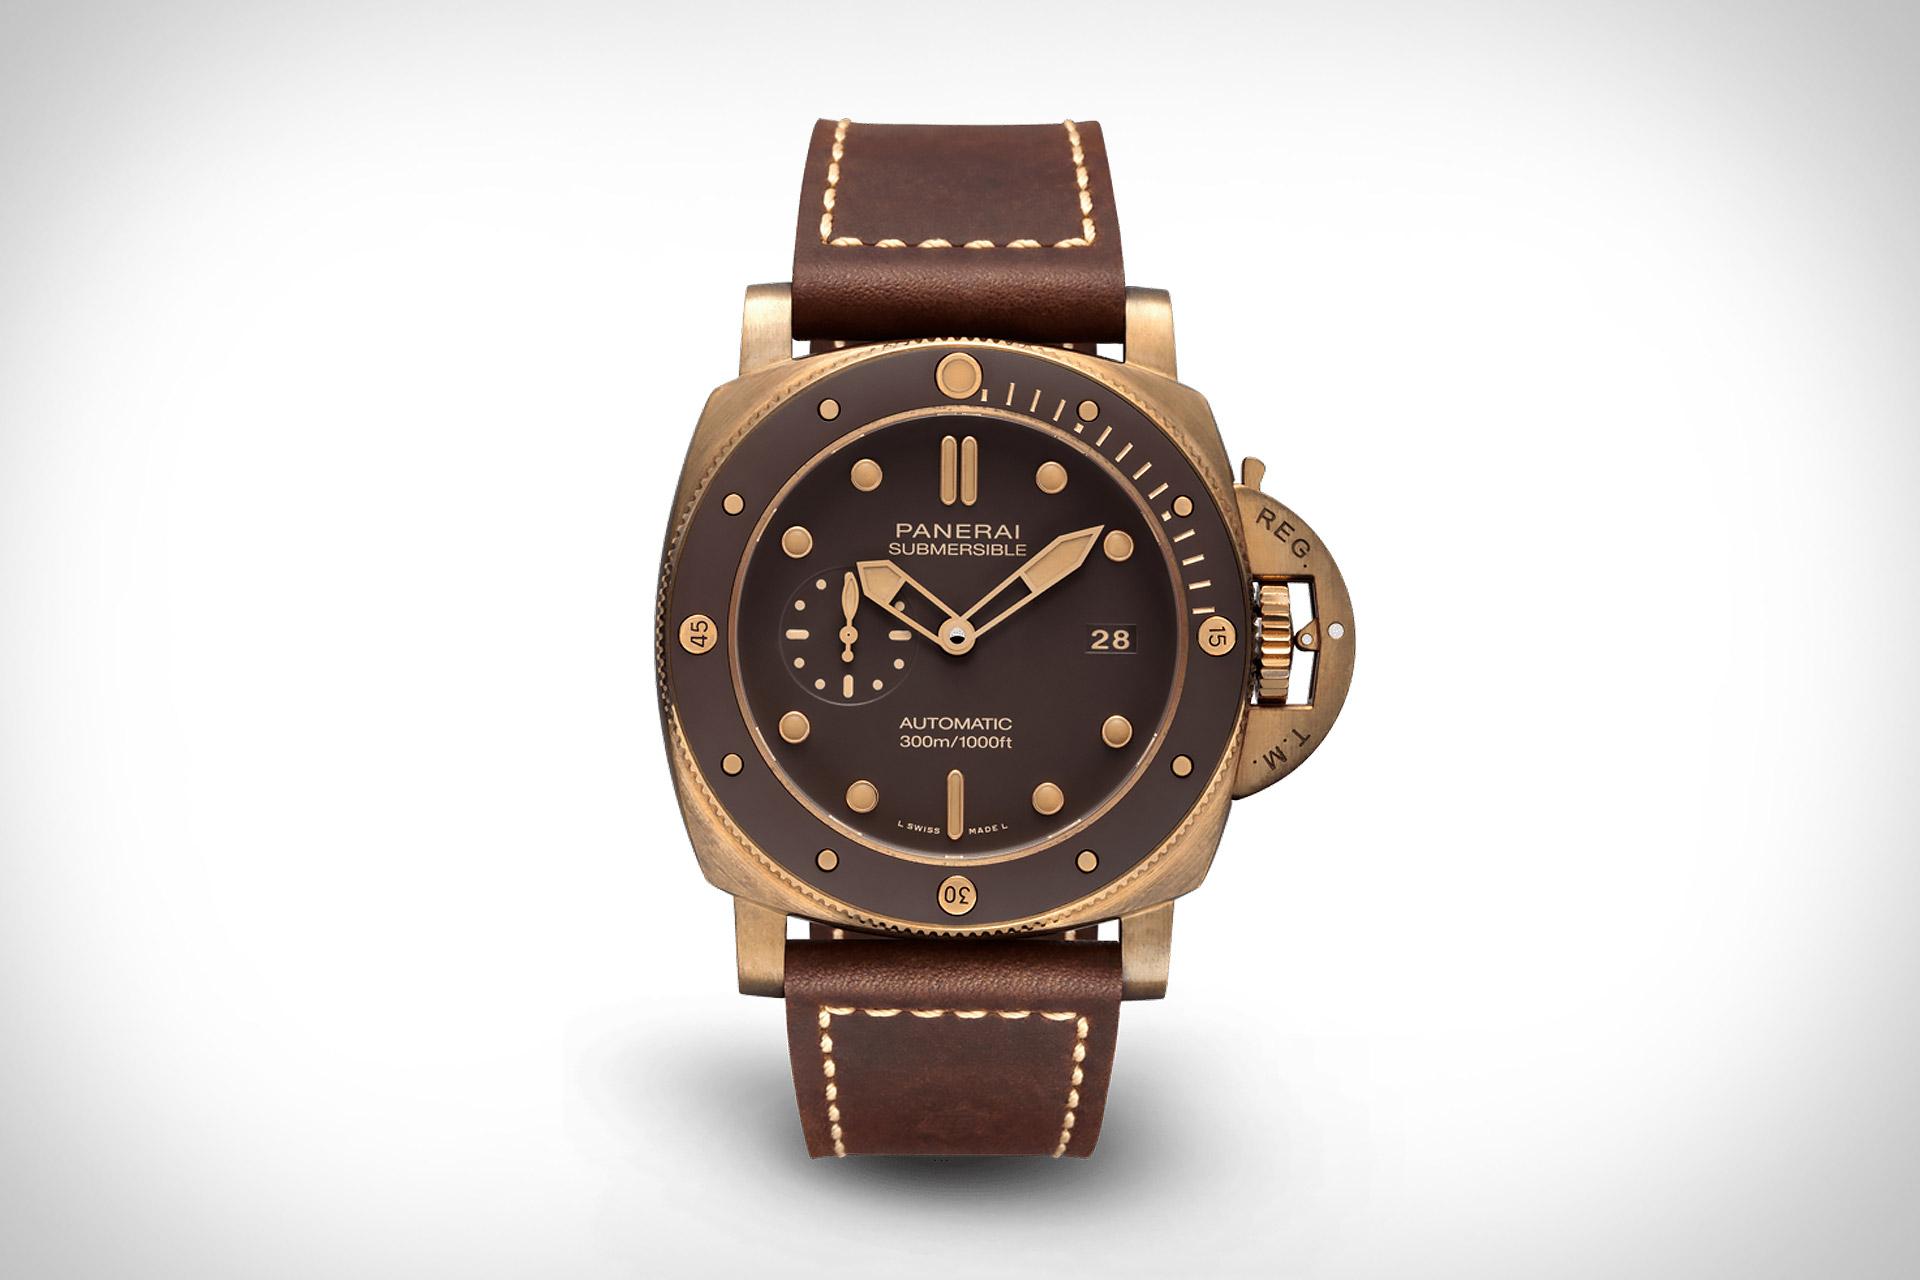 Panerai Submersible Bronzo Watch